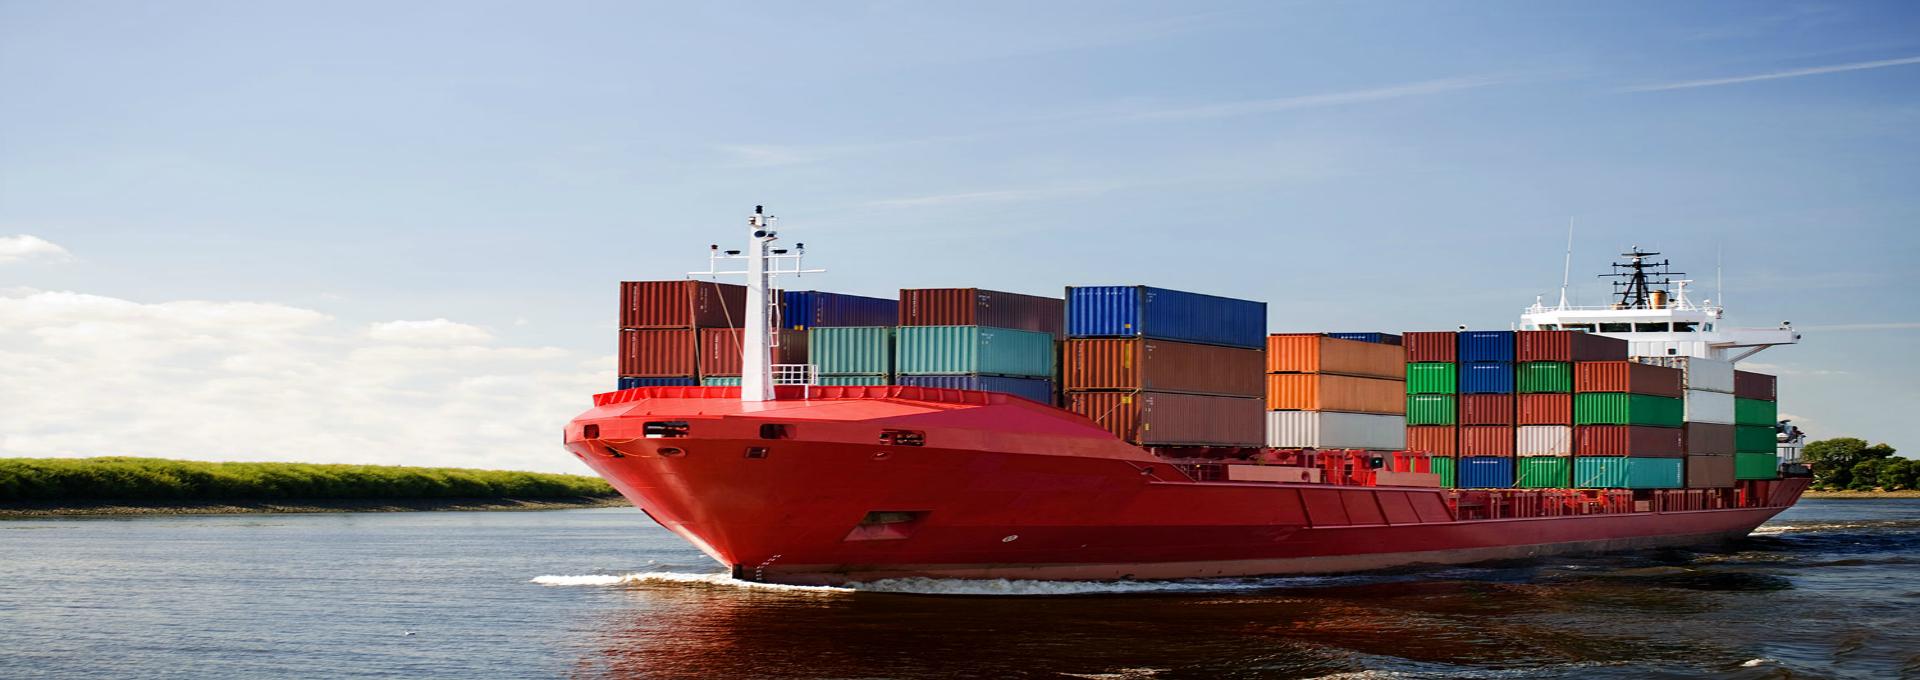 Removal Goods Kenya - Removals Sea